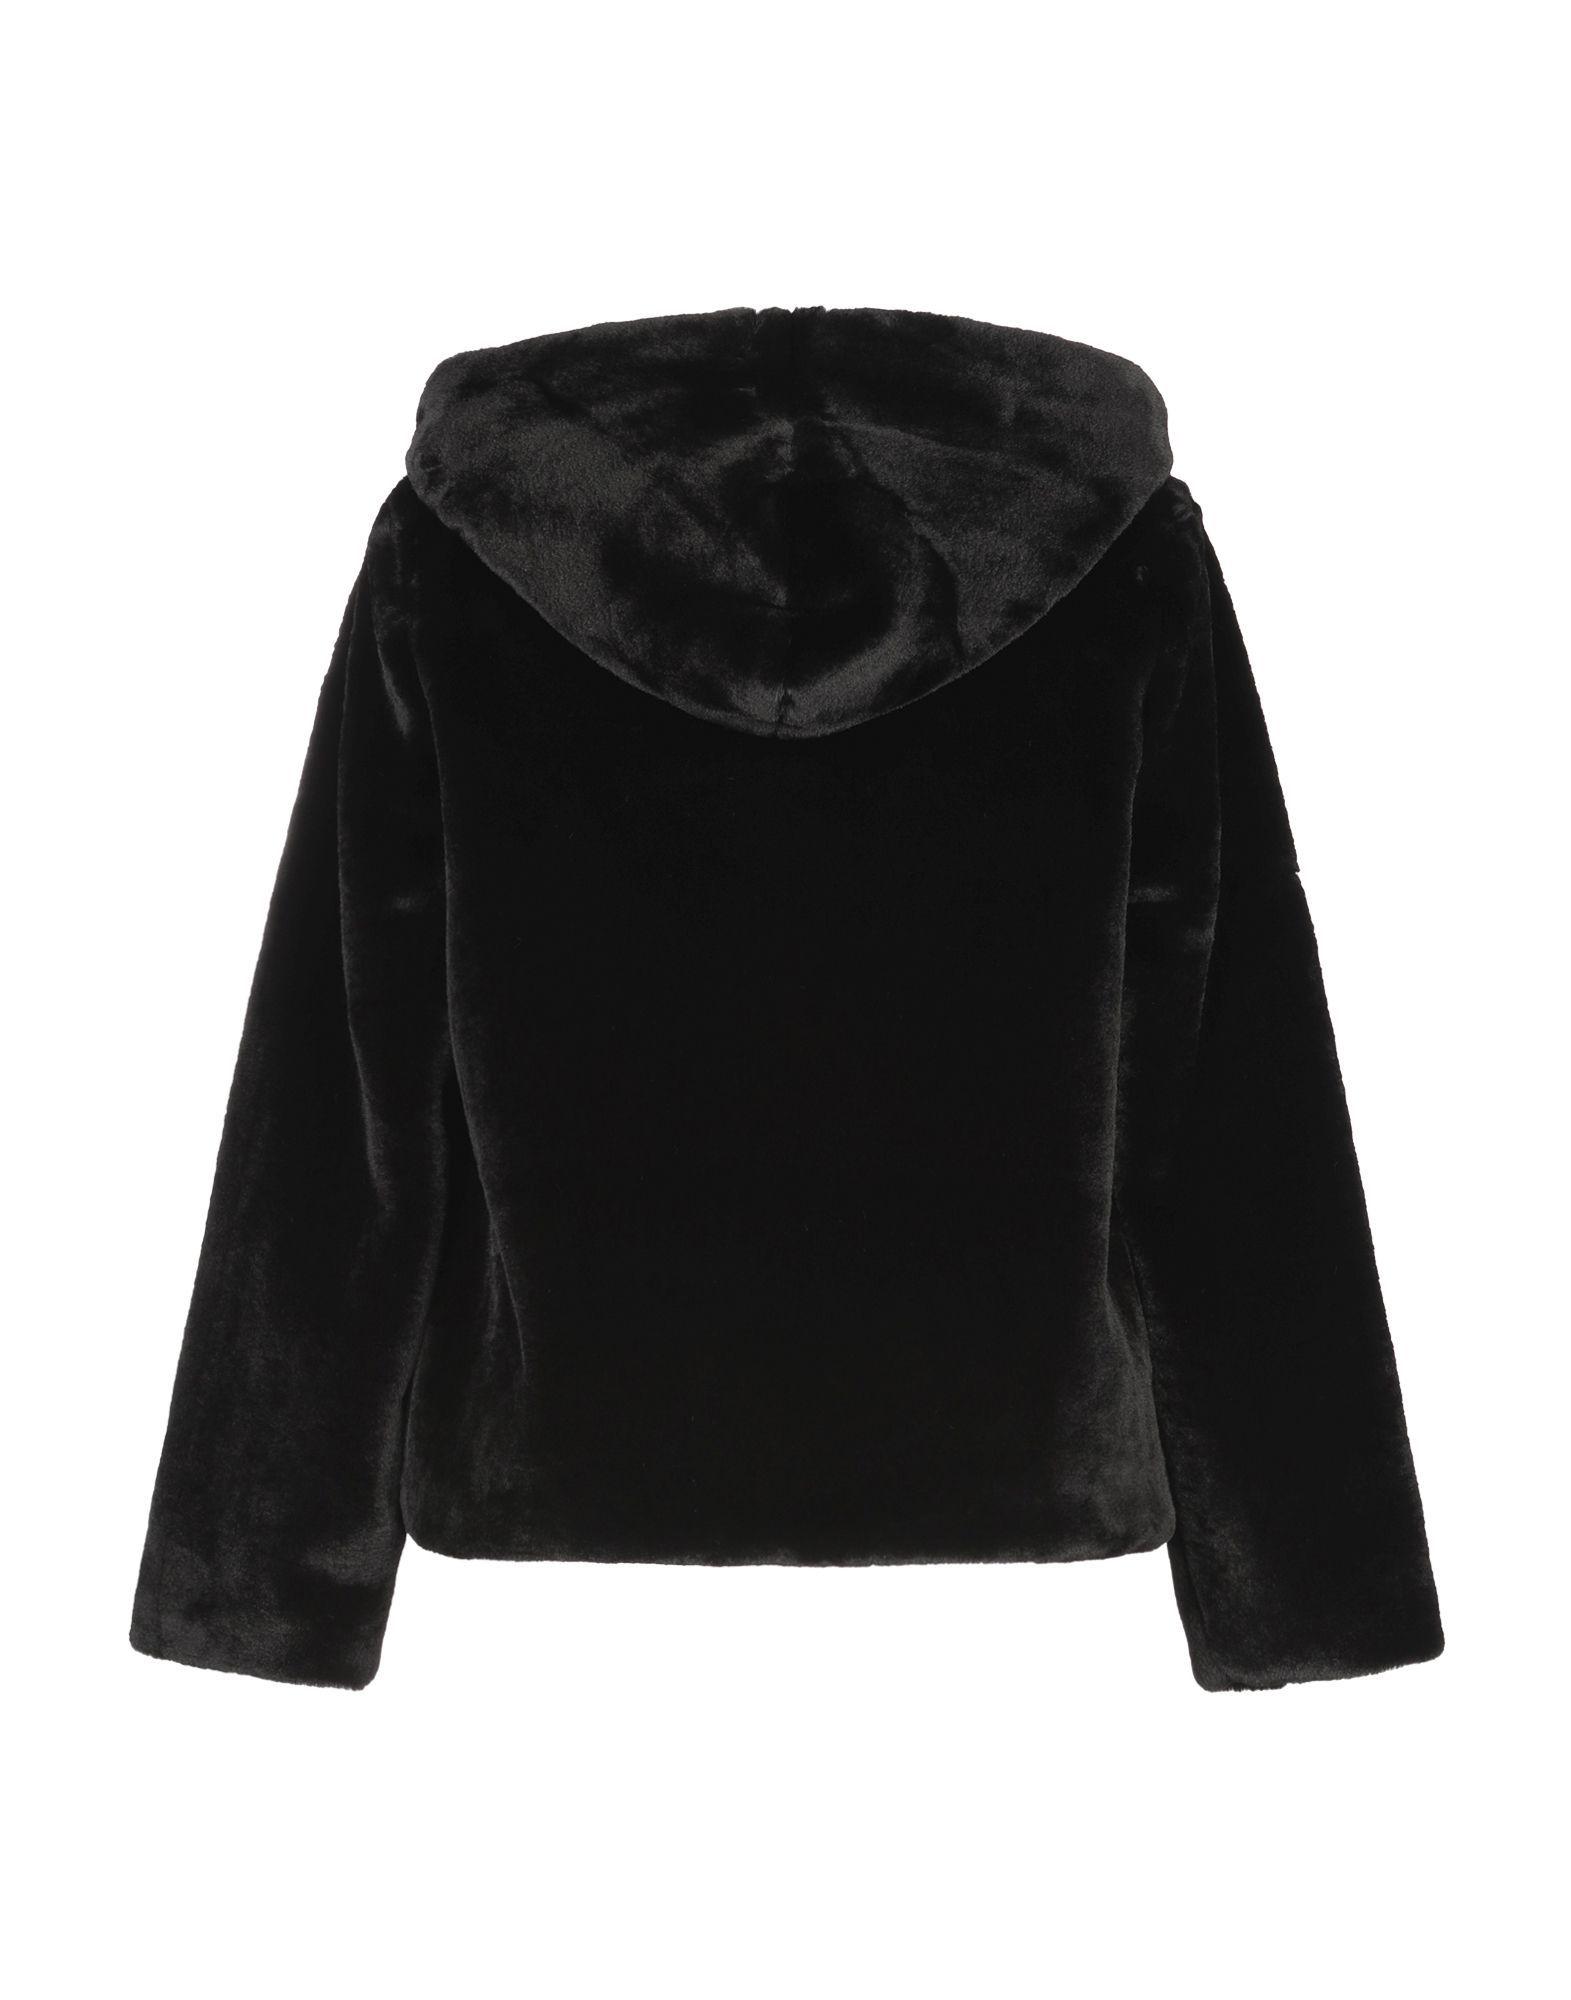 COATS & JACKETS Twenty Easy By Kaos Black Woman Polyester